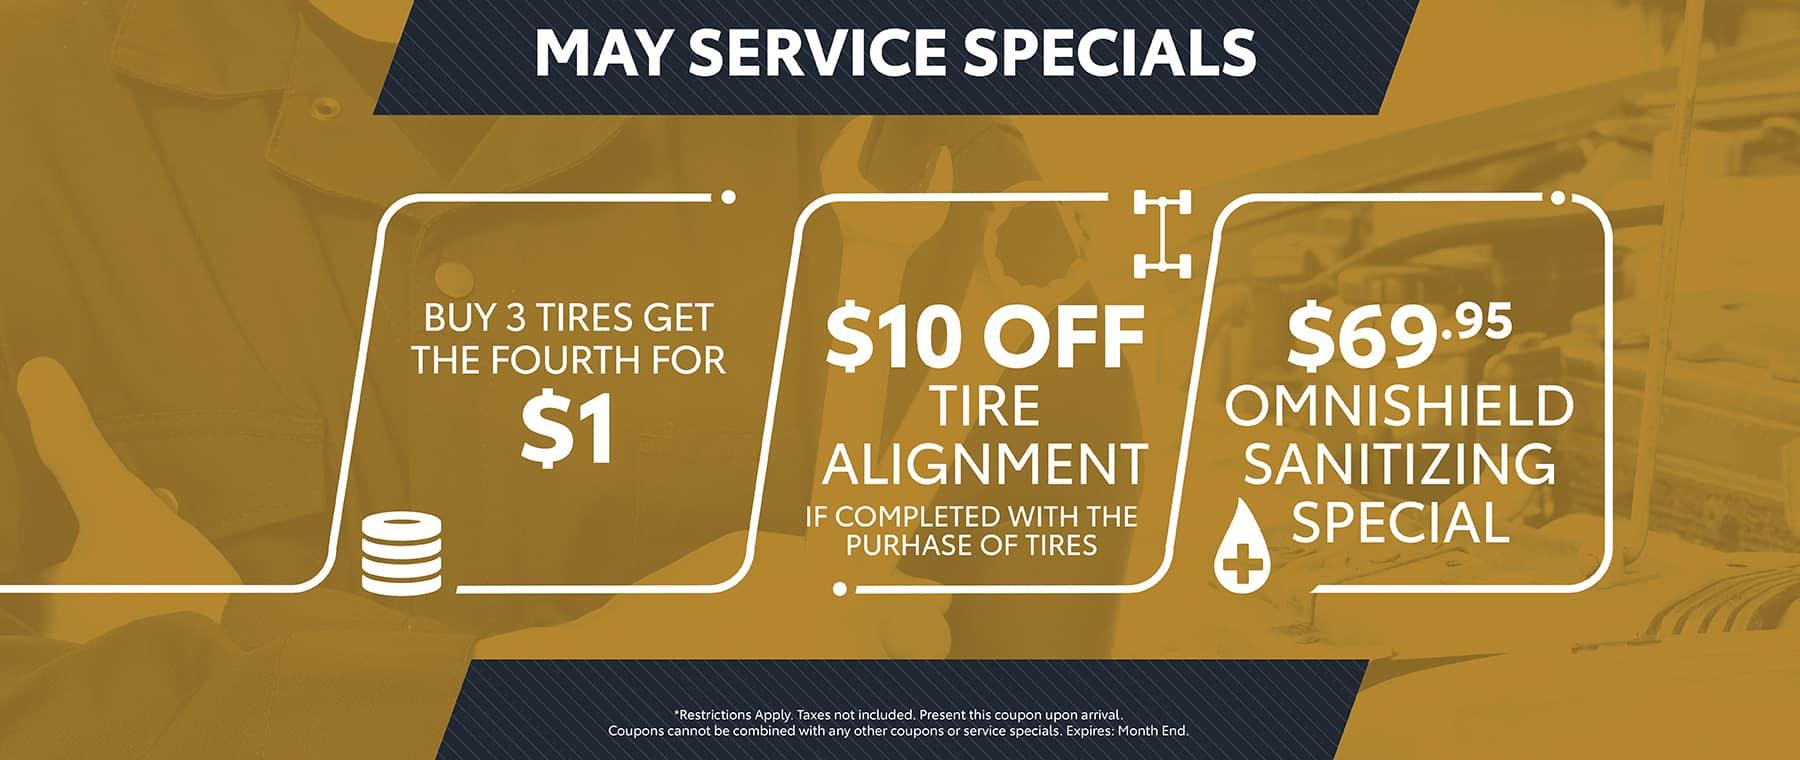 MAY - service specials